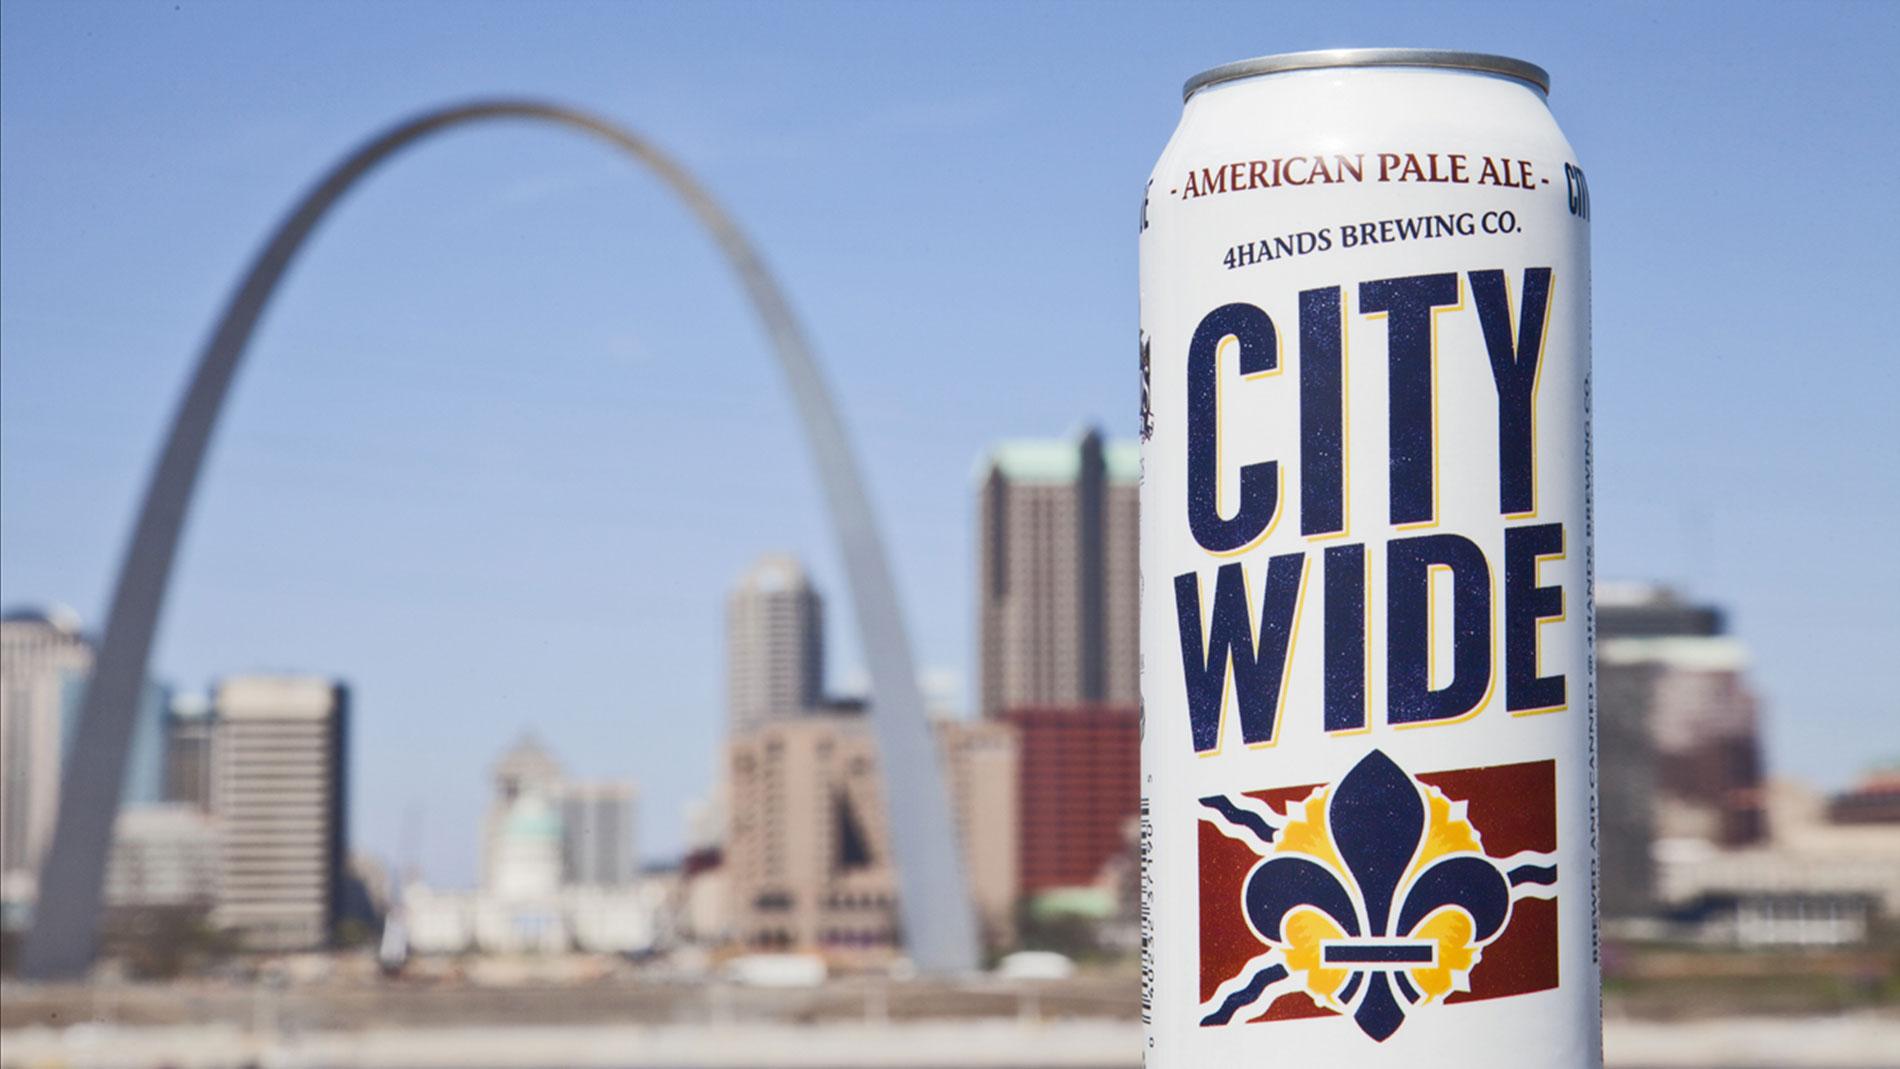 4 Hands Brewing Co.'s City Wide pale ale